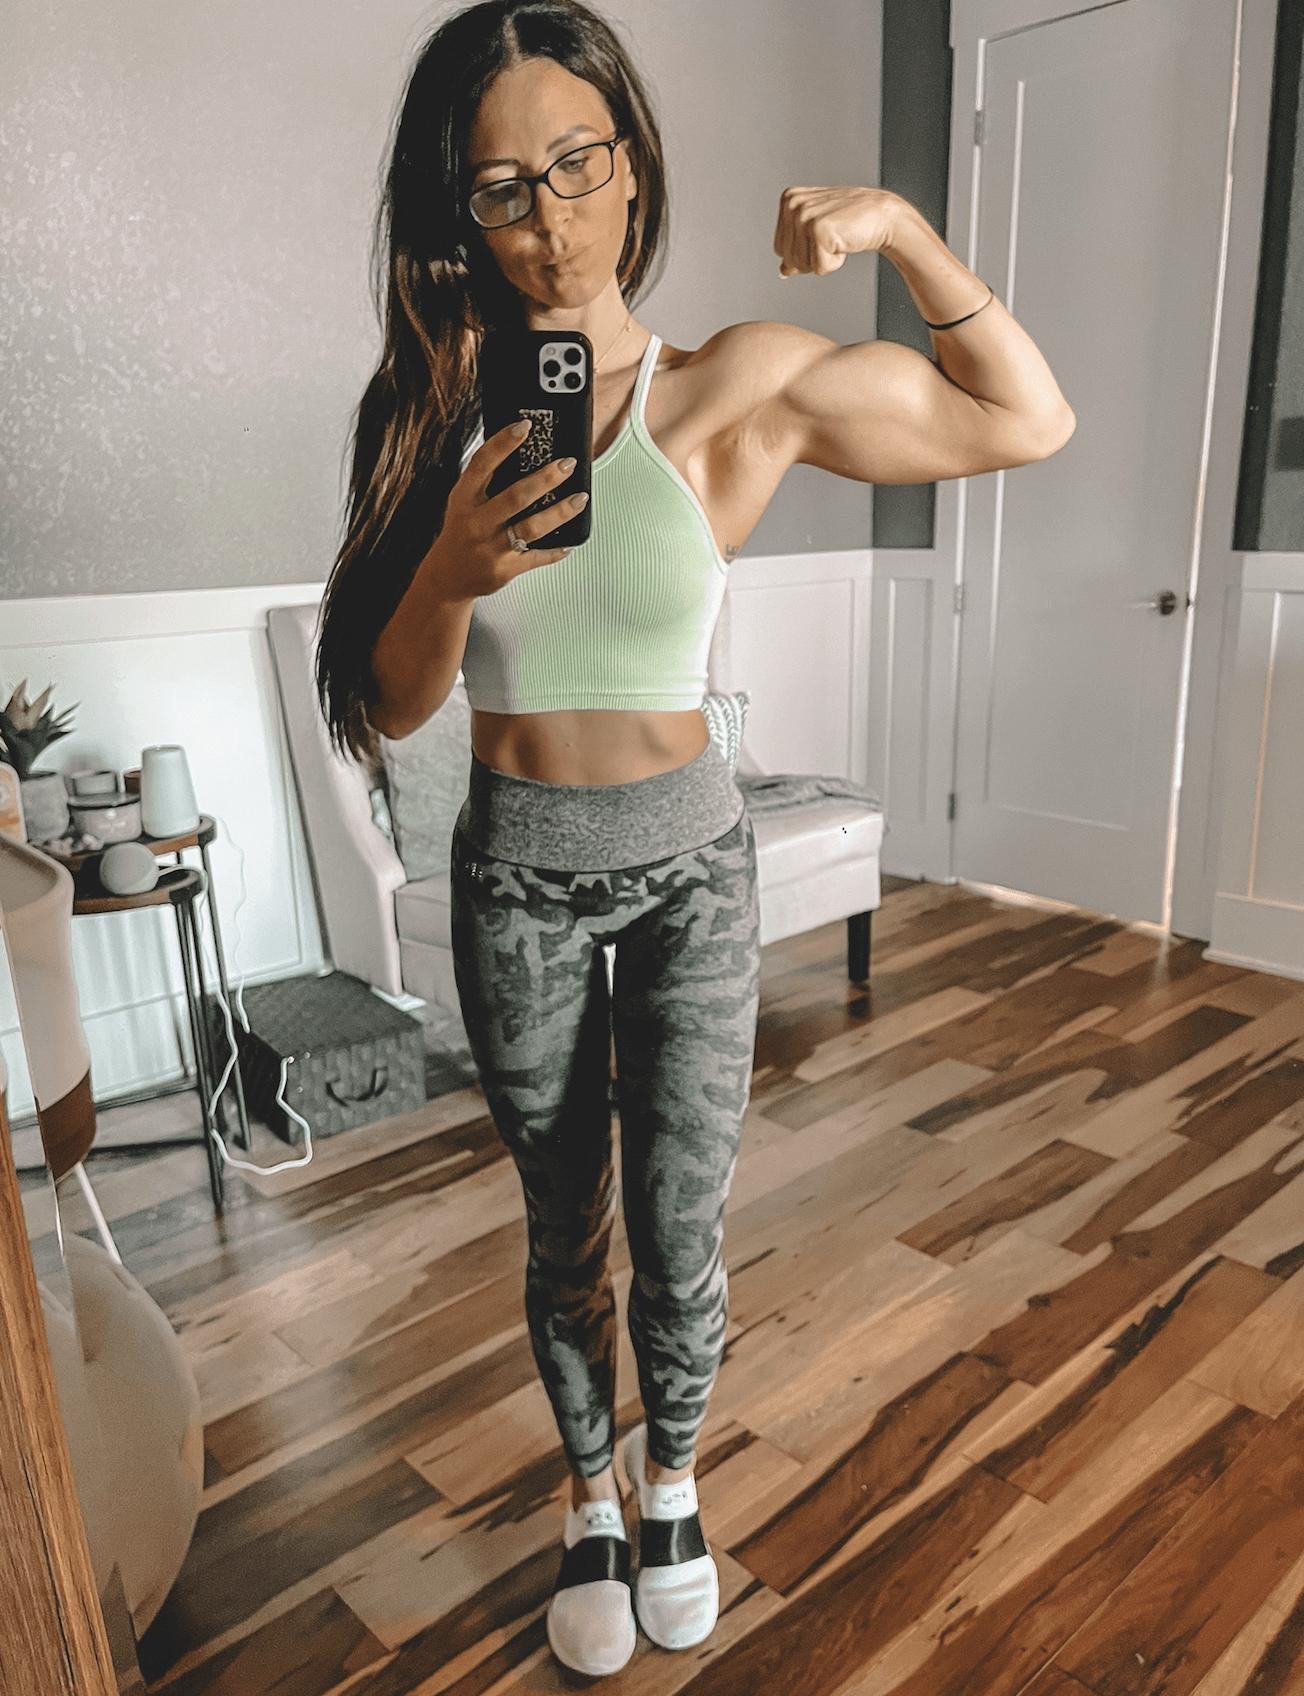 sarah bowmar supplement schedule